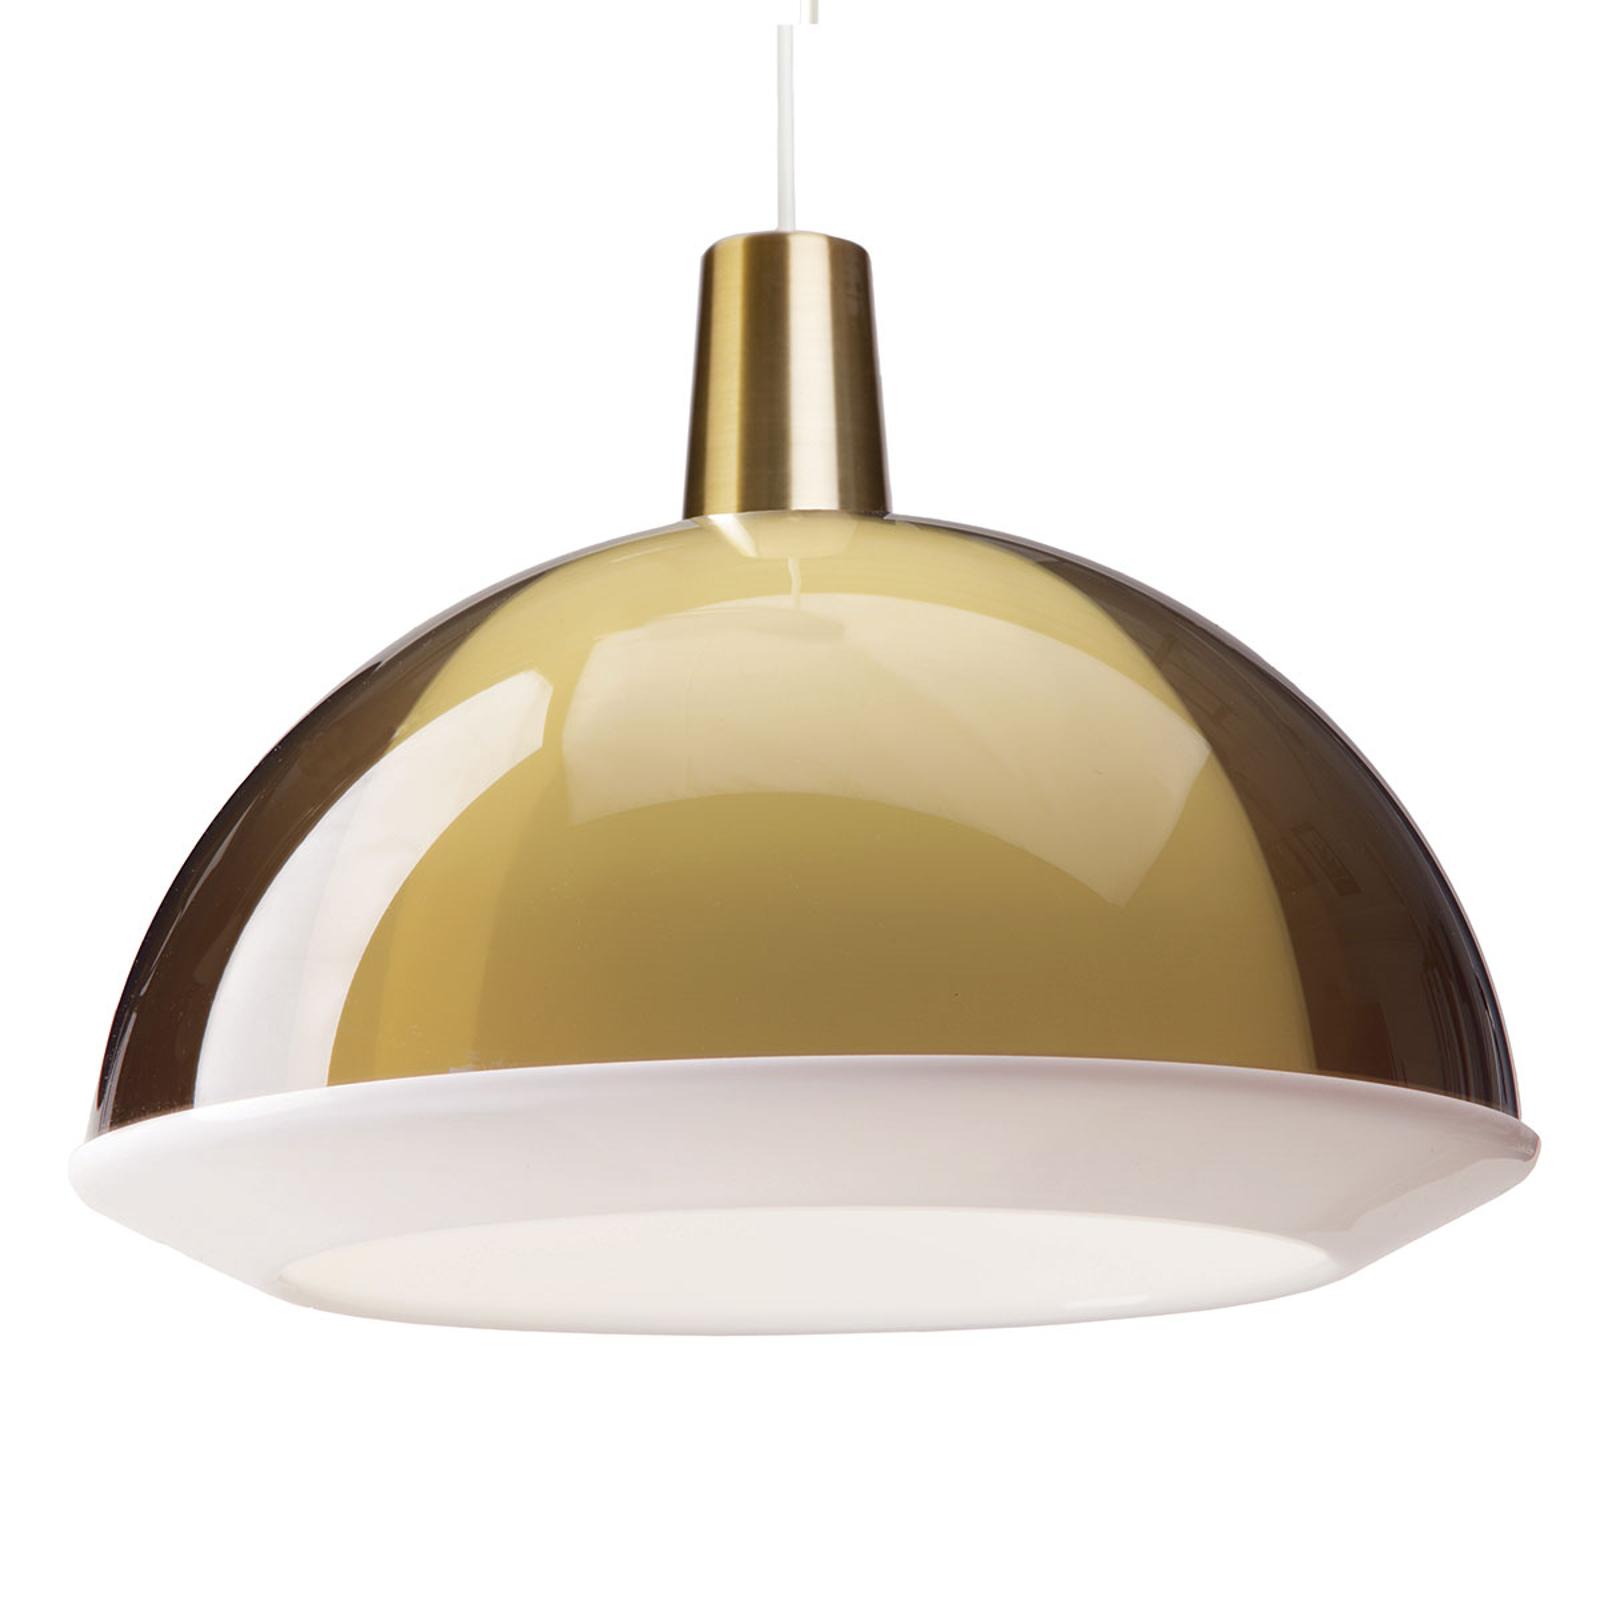 Innolux Kuplat 400 hanglamp 40 cm zand